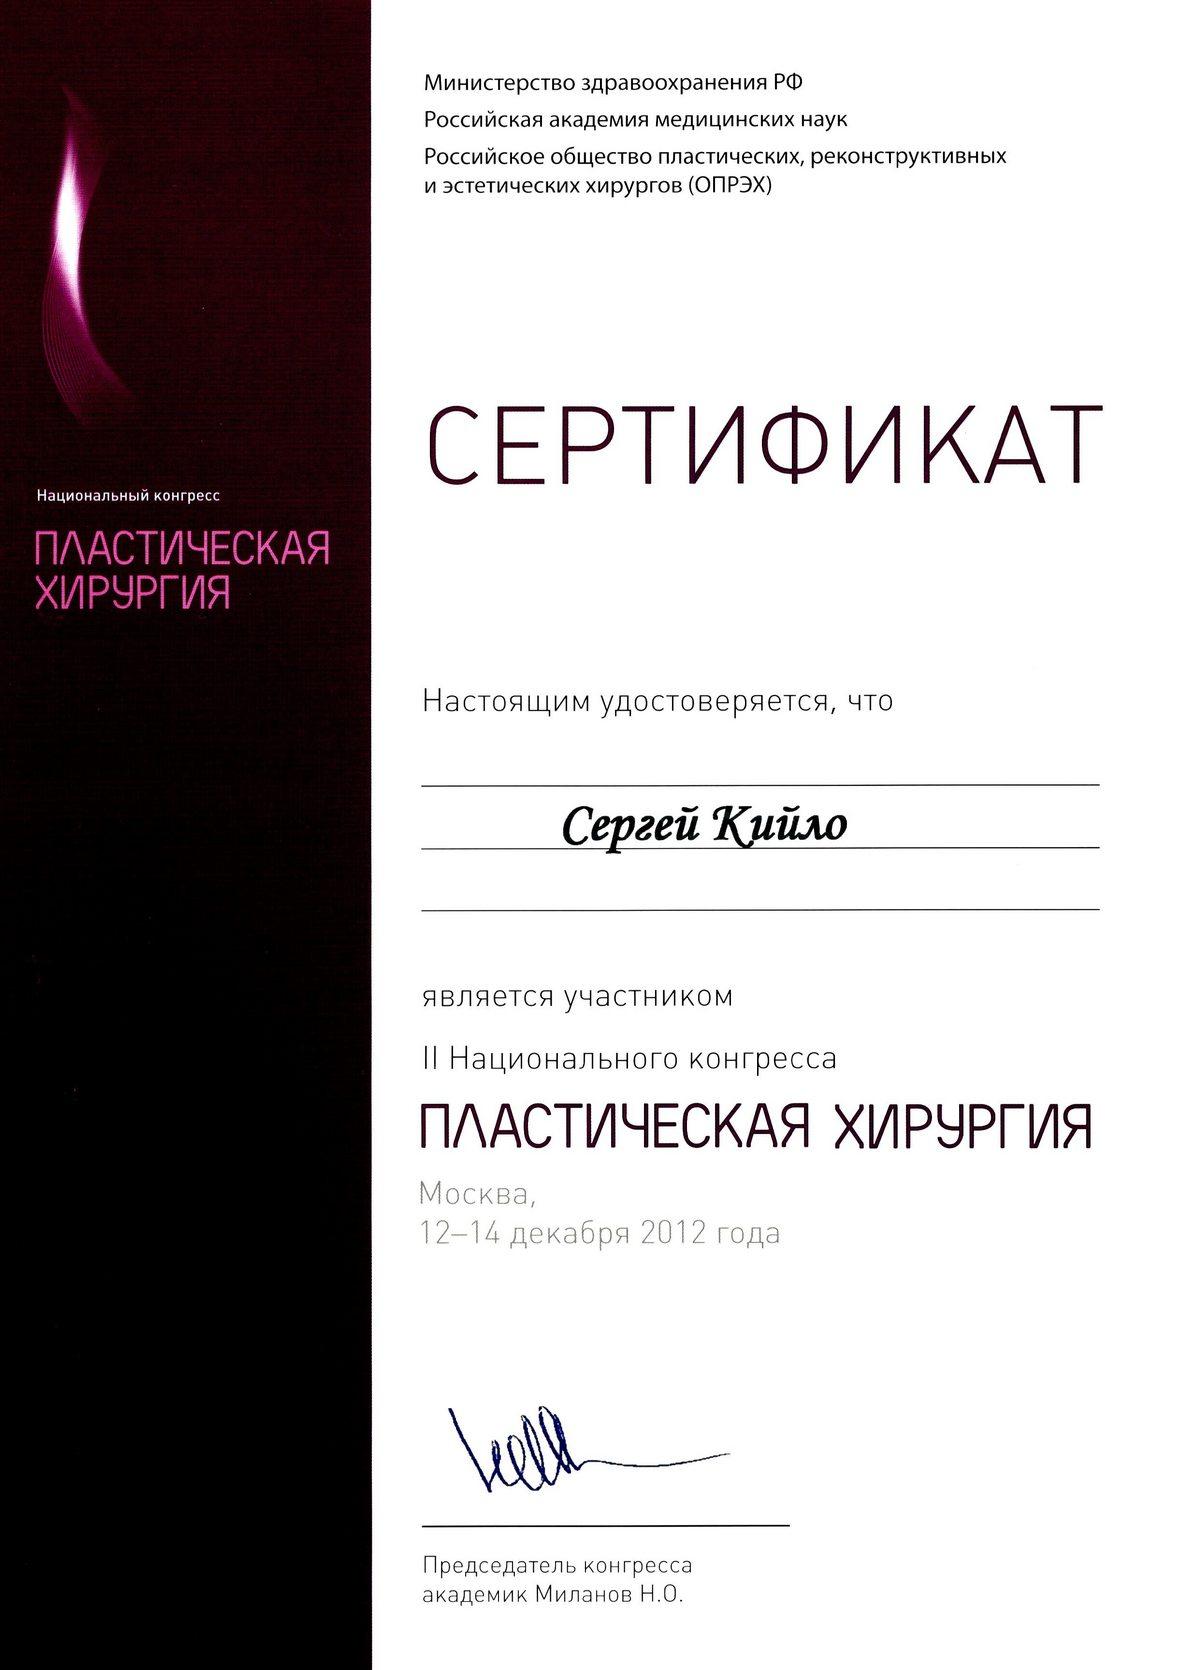 Документ №:32 Сертификат пластического хирурга Кийло Сергея Алексеевича